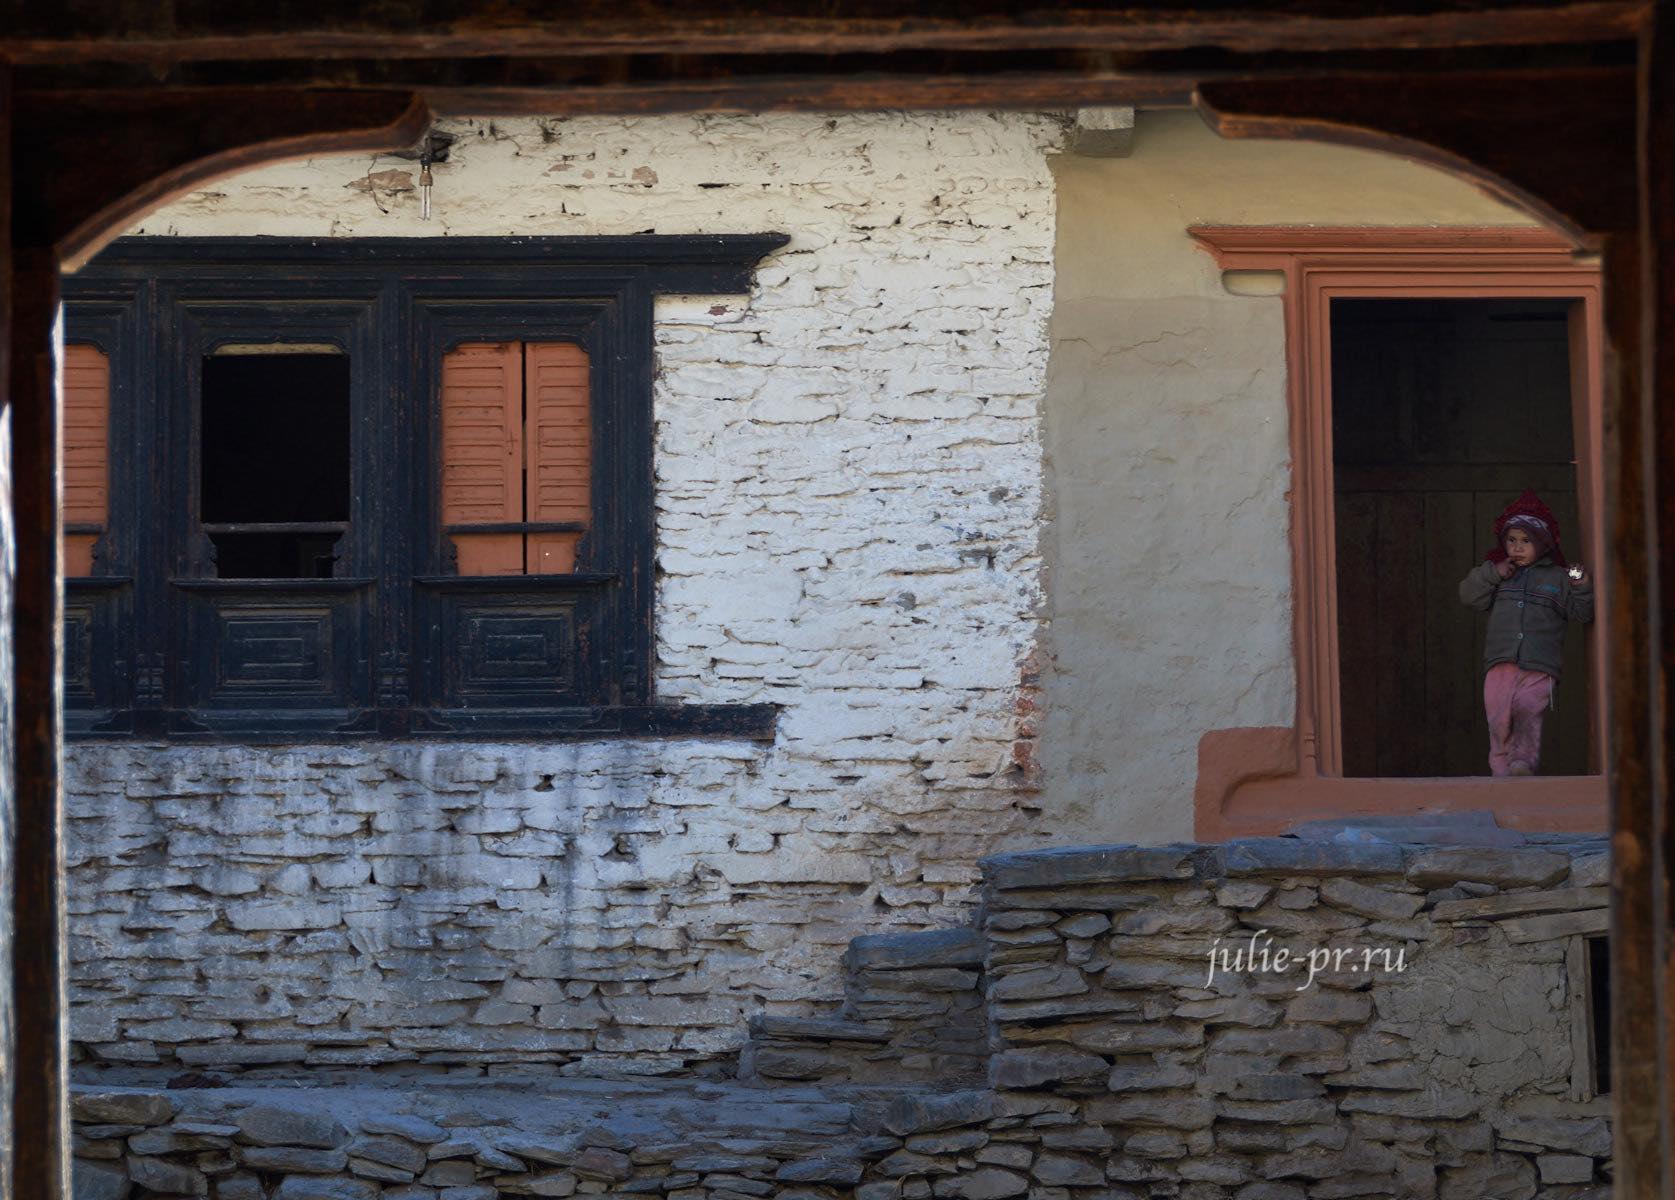 Непал, Деревня Чхаиро, Трек вокруг Аннапурны